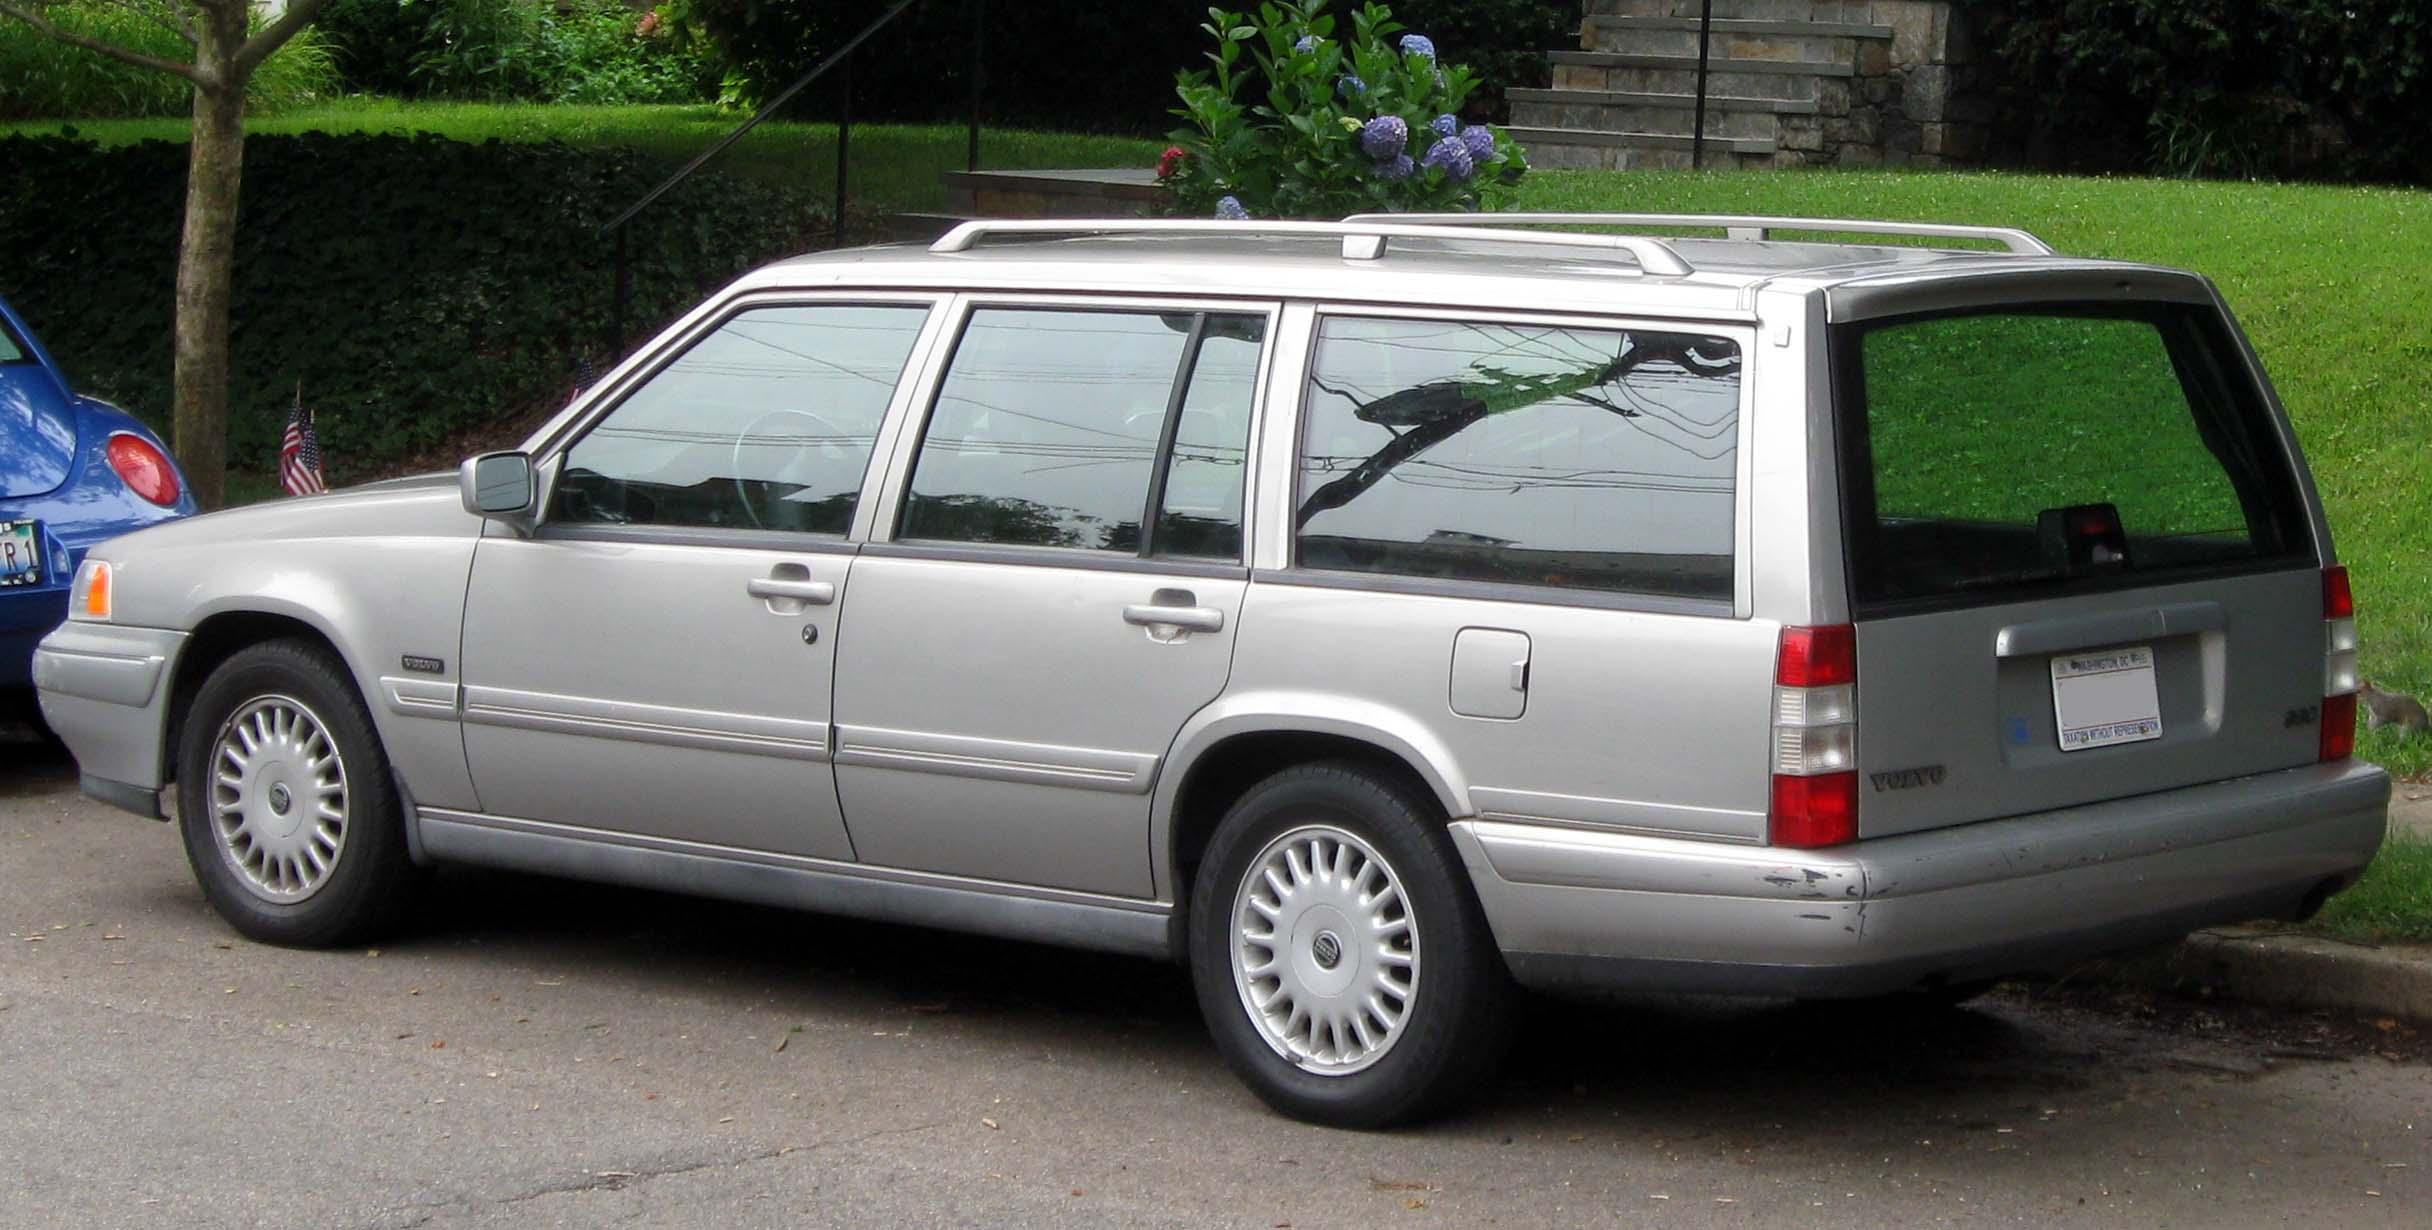 volvo 960 i 1990 1994 station wagon 5 door outstanding cars rh carsot com 95 Volvo 960 Upgrade 1995 volvo 960 repair manual